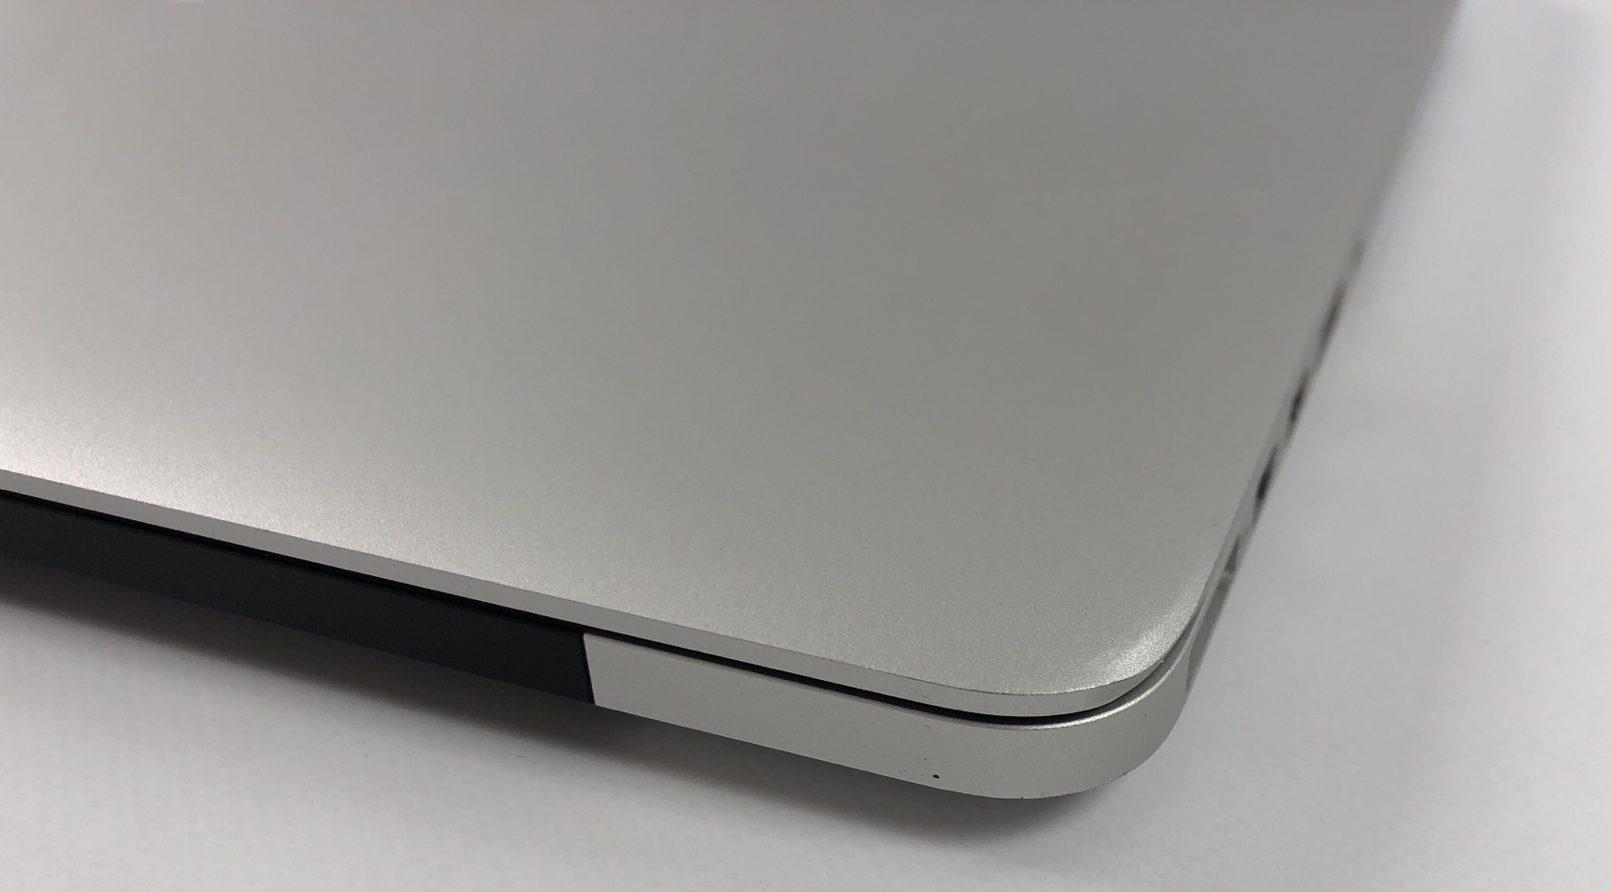 "MacBook Pro Retina 13"" Early 2015 (Intel Core i5 2.7 GHz 8 GB RAM 256 GB SSD), Intel Core i5 2.7 GHz, 8 GB RAM, 256 GB SSD, Kuva 4"